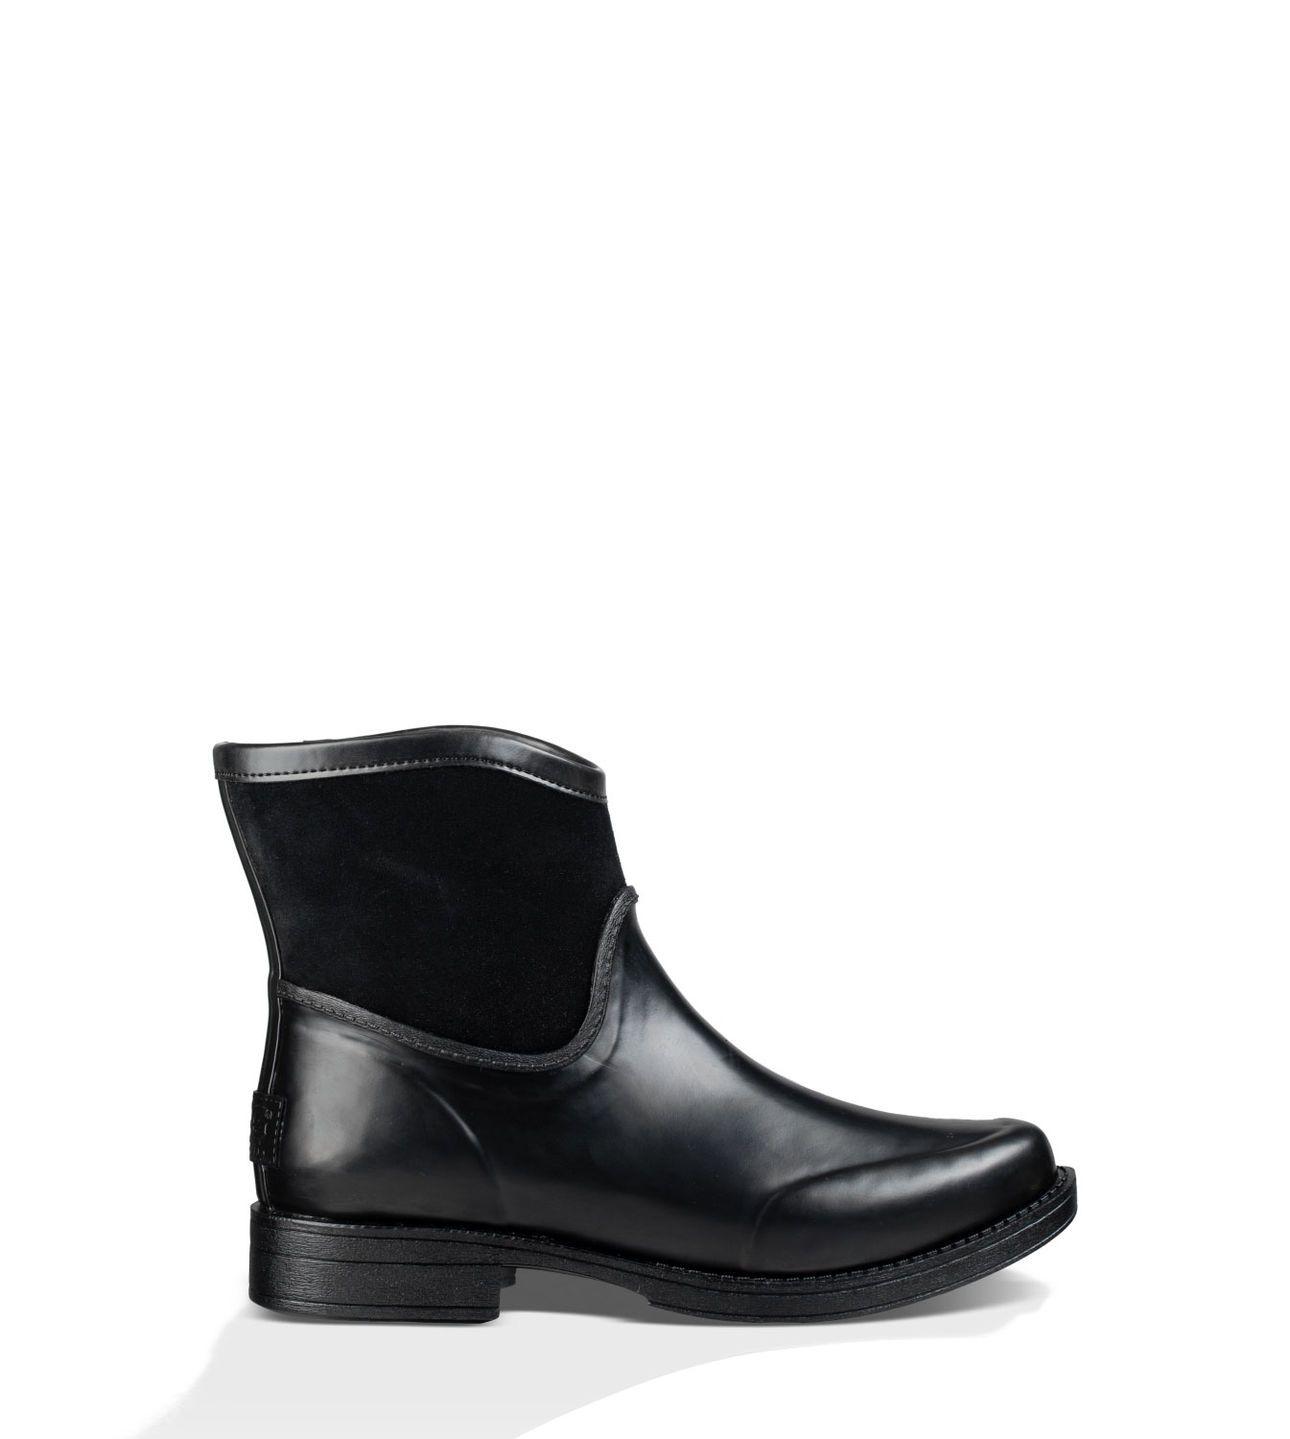 UGG Paxton Waterproof Boot (Women's) boZjcjFGfN